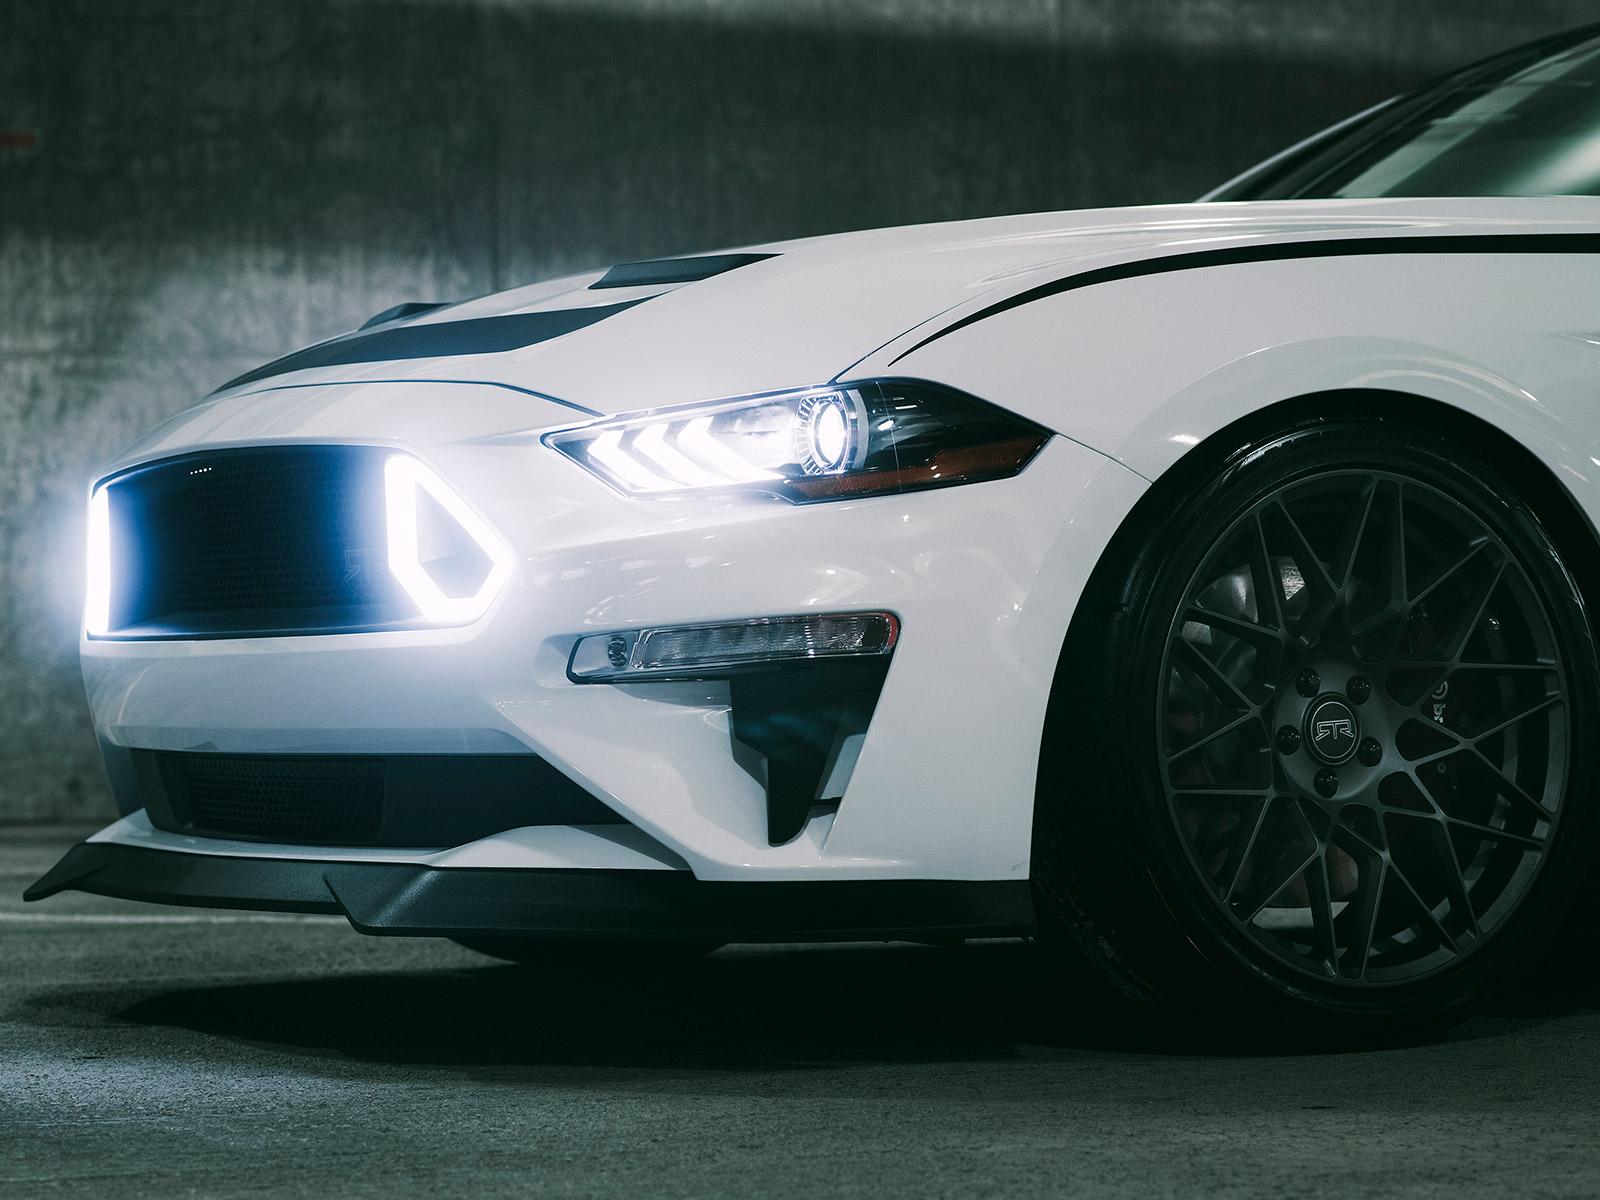 Vaughn Gittin Jr.'s 2018 Ford Mustang RTR Packs North of ...